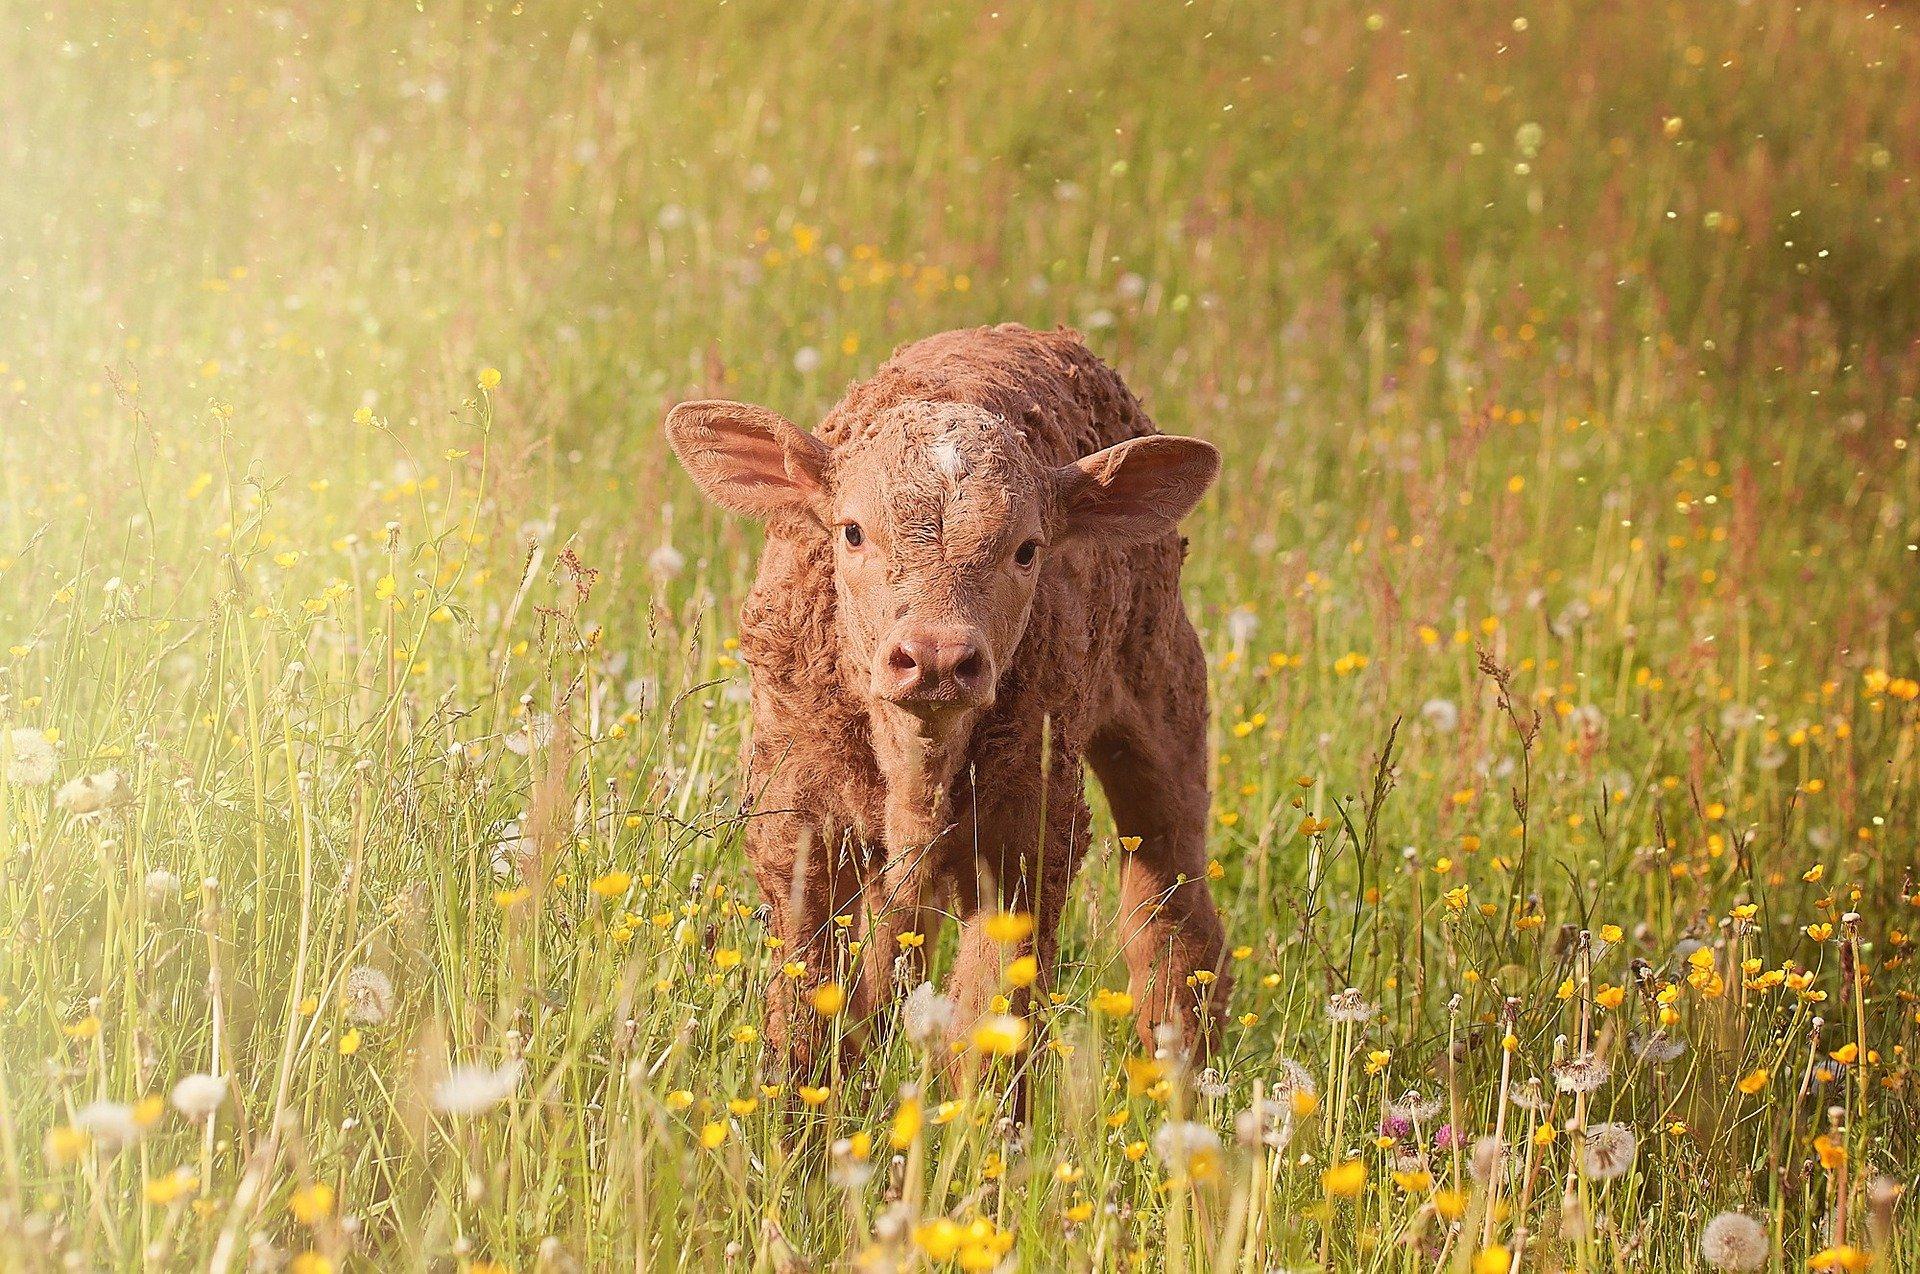 28 May - Newborns (Taboo joy)